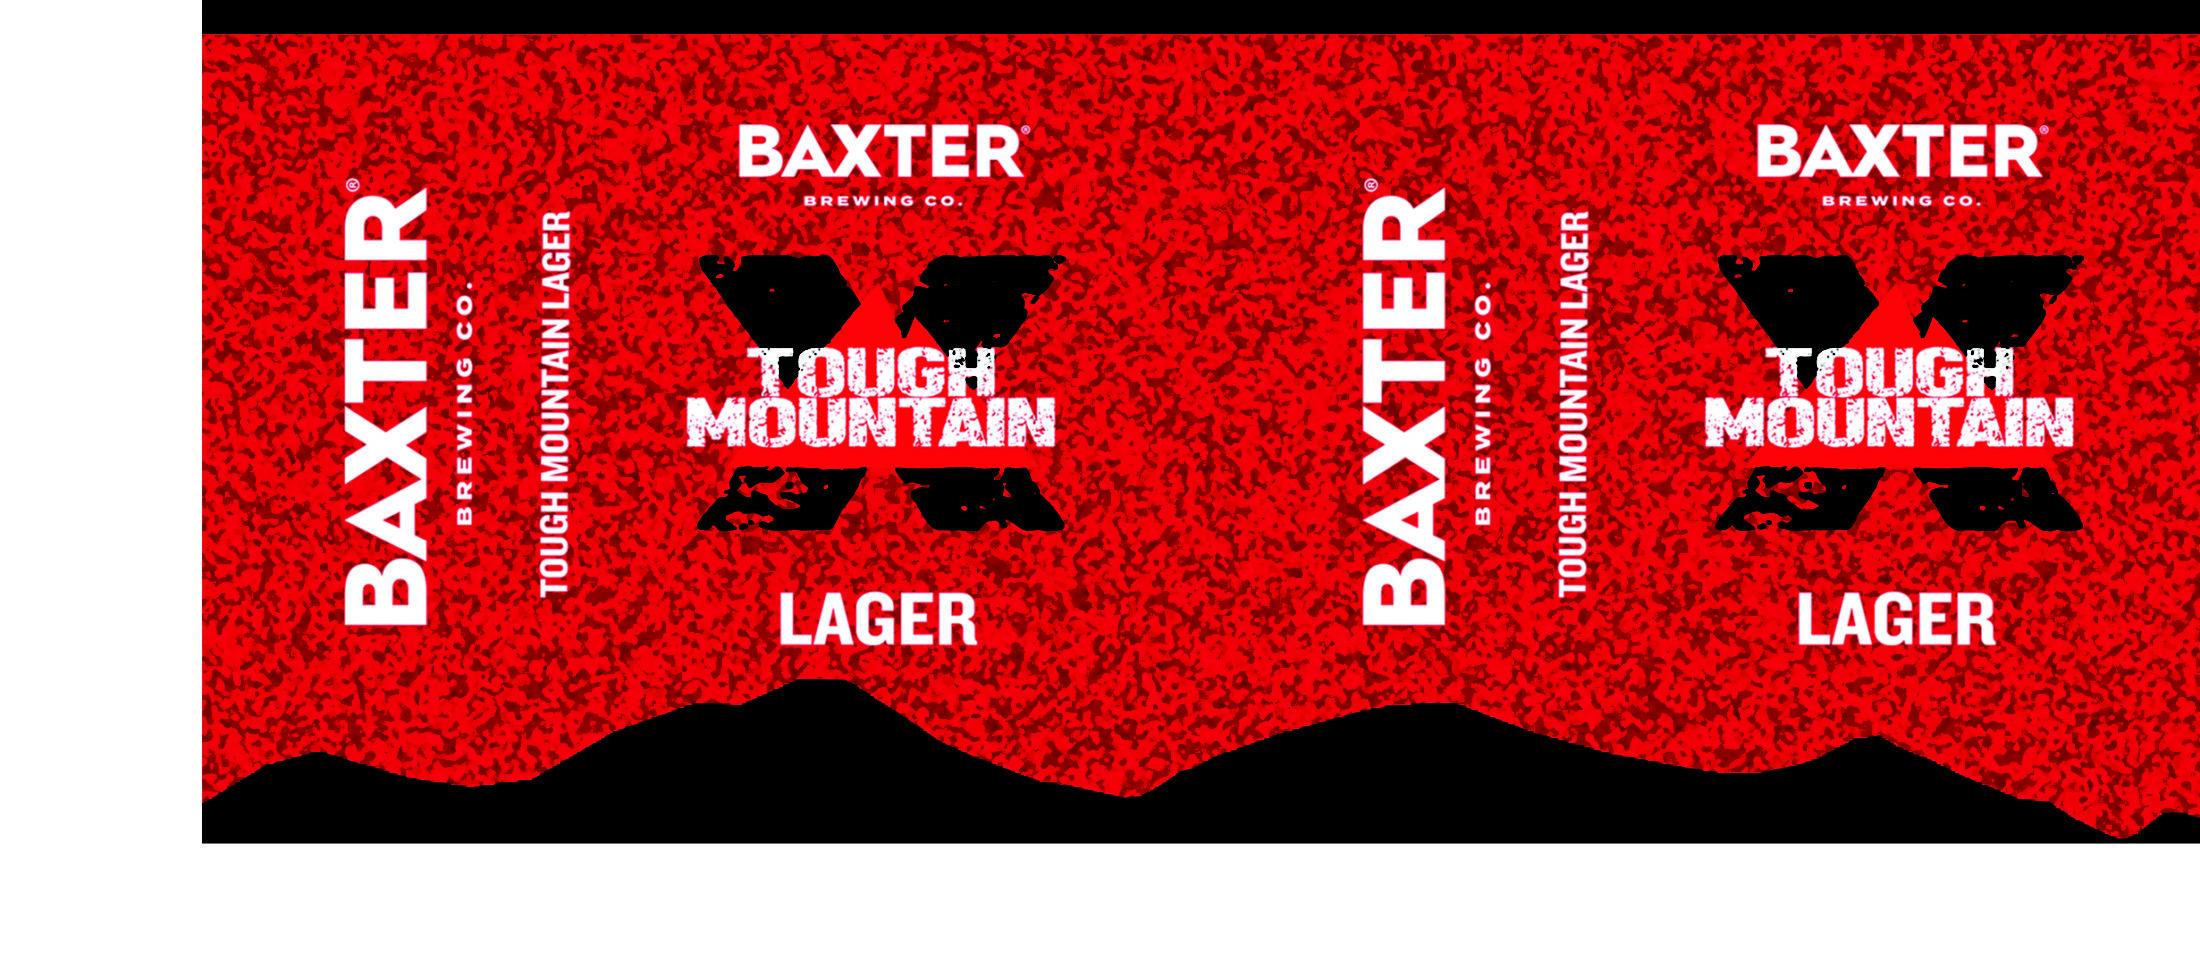 Tough Mountain Lager Baxter Brewing Co